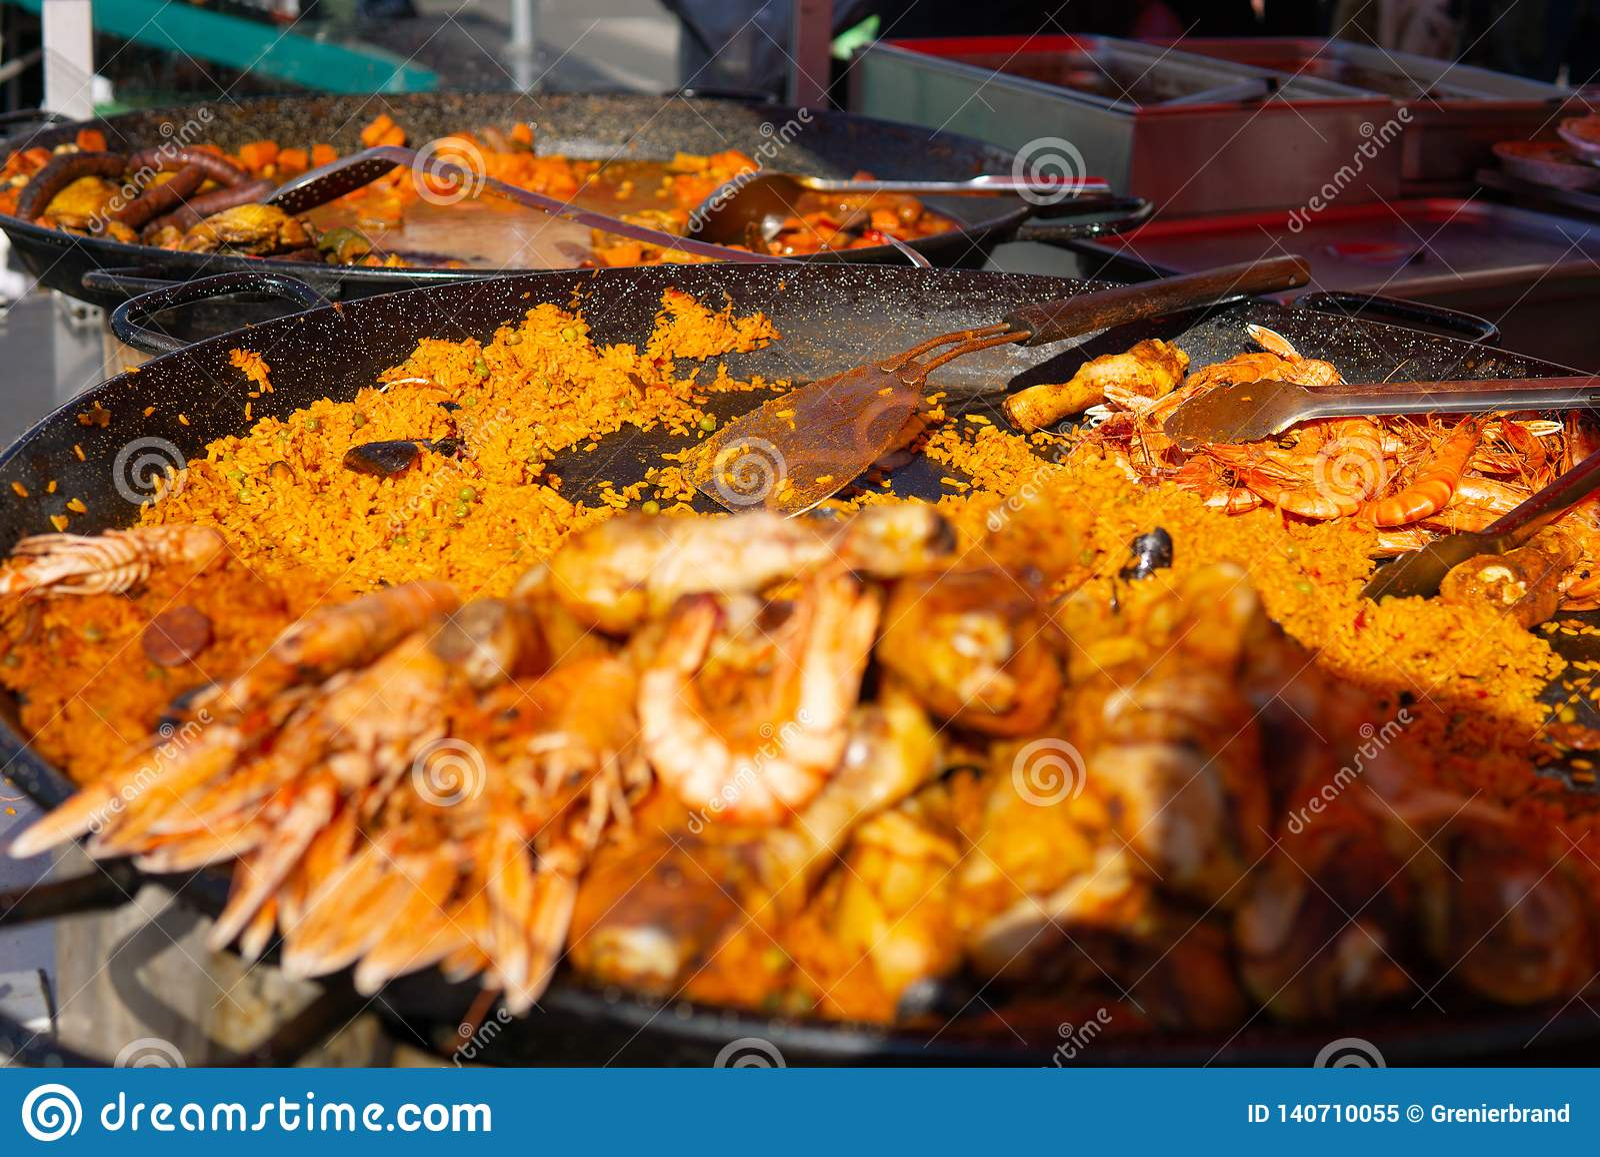 Paella pan at seafood and farmers market